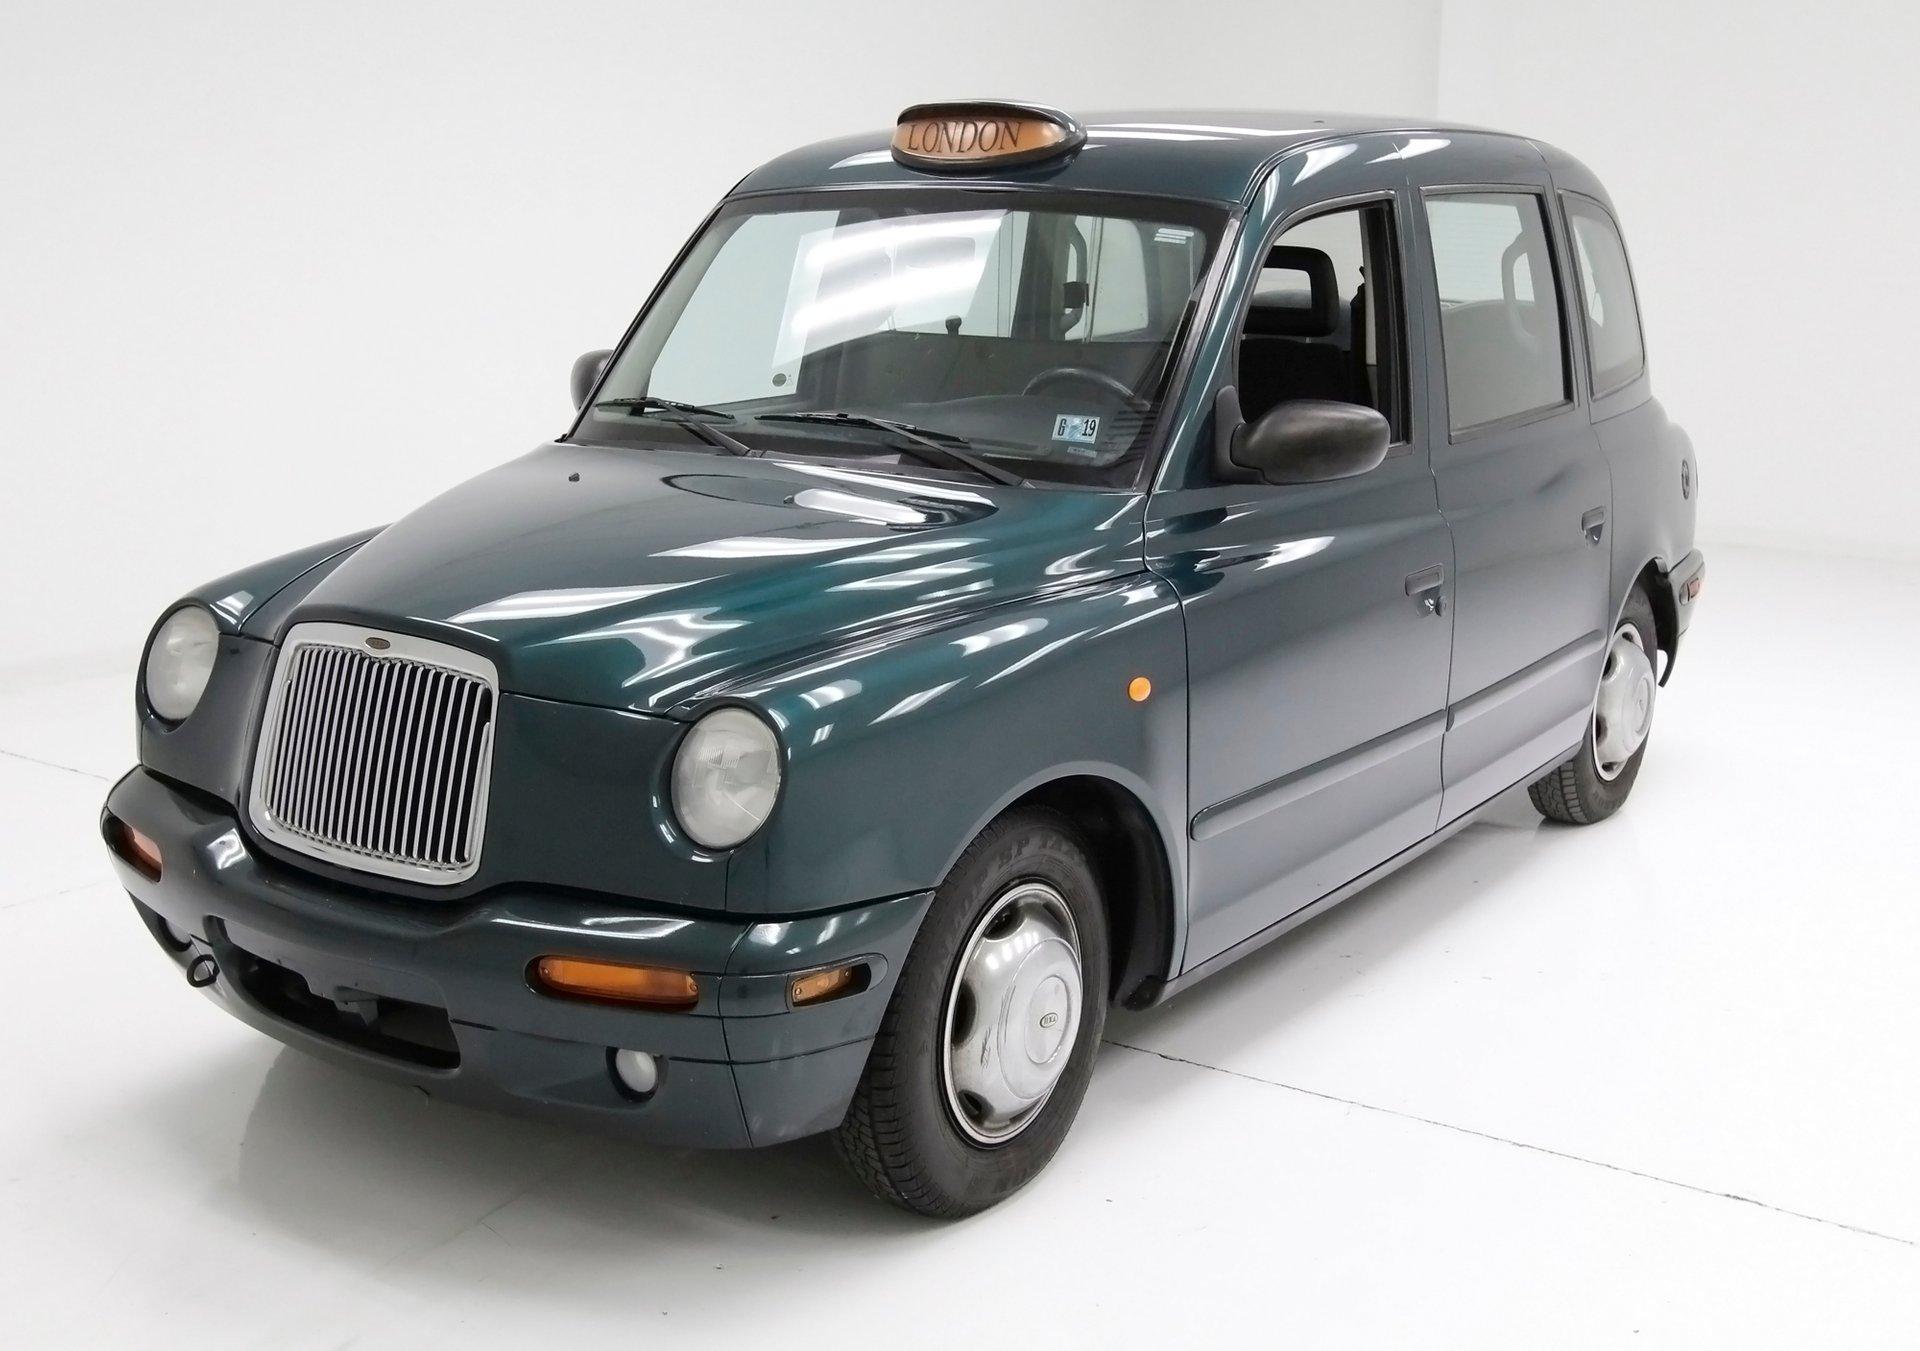 2004 London Taxi International